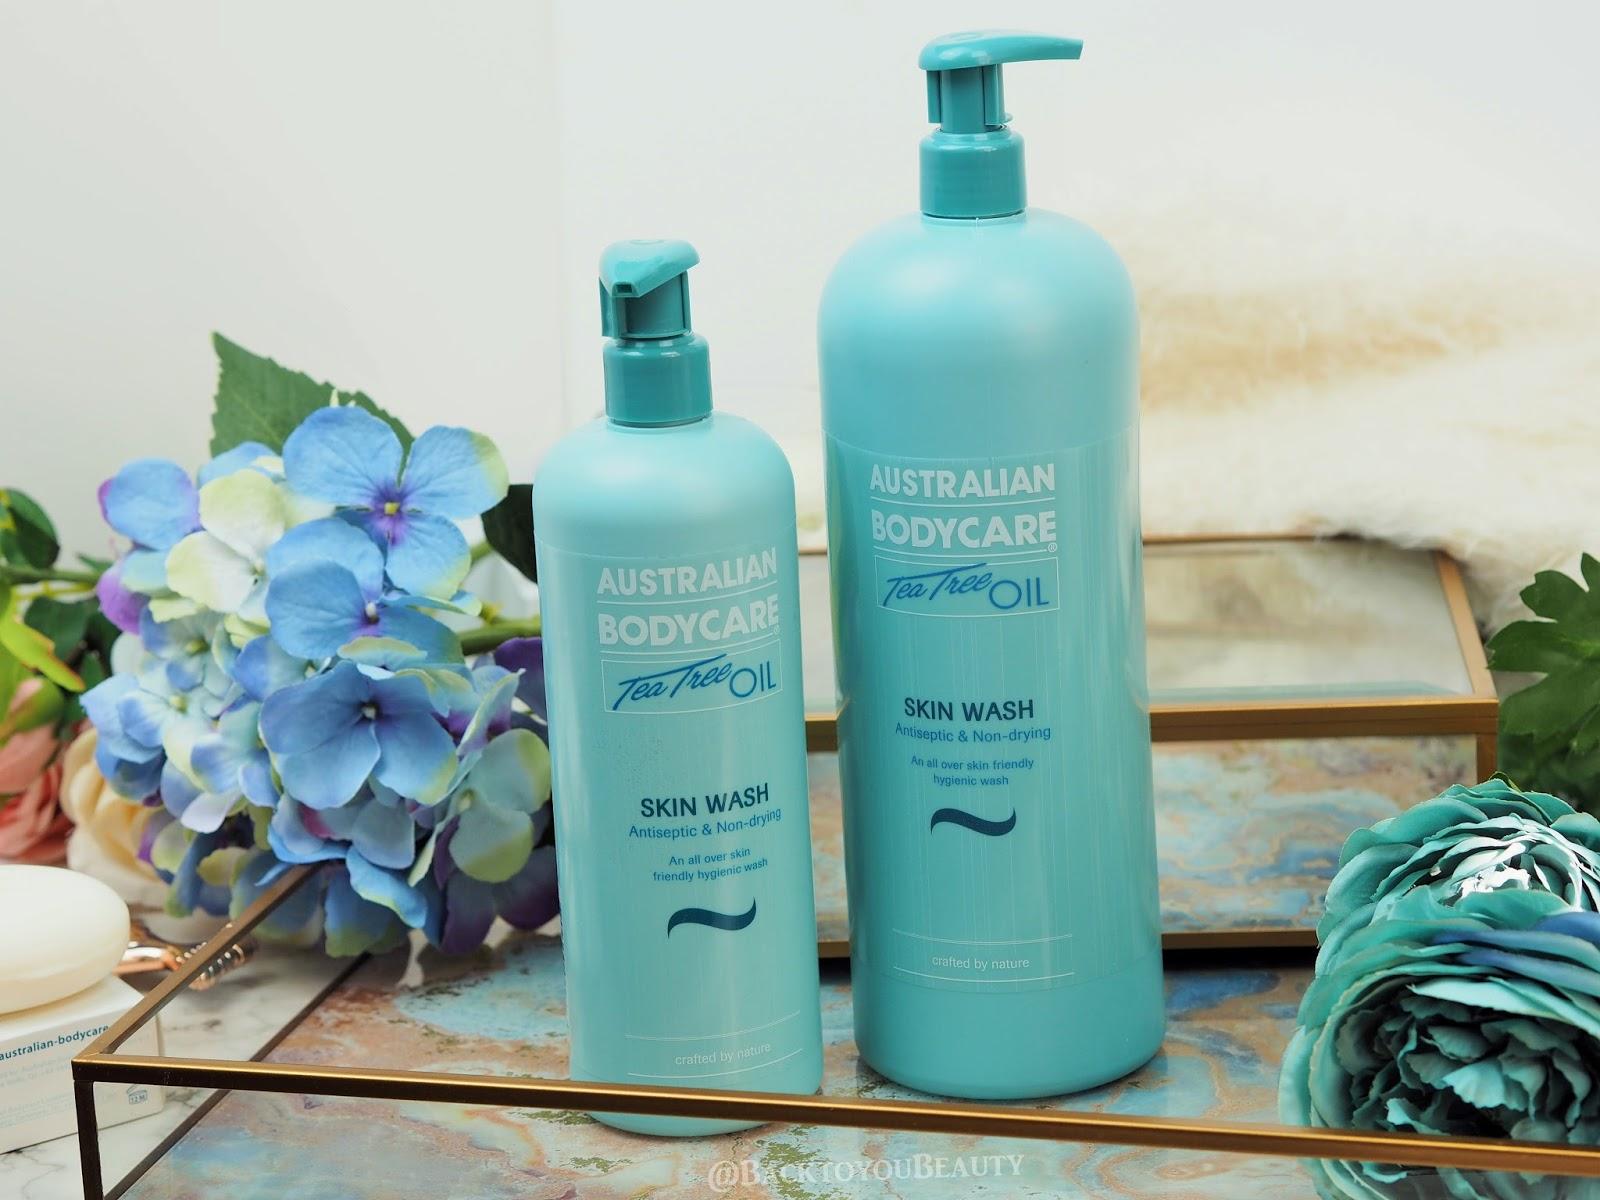 Australian Bodycare Skinwash Duo